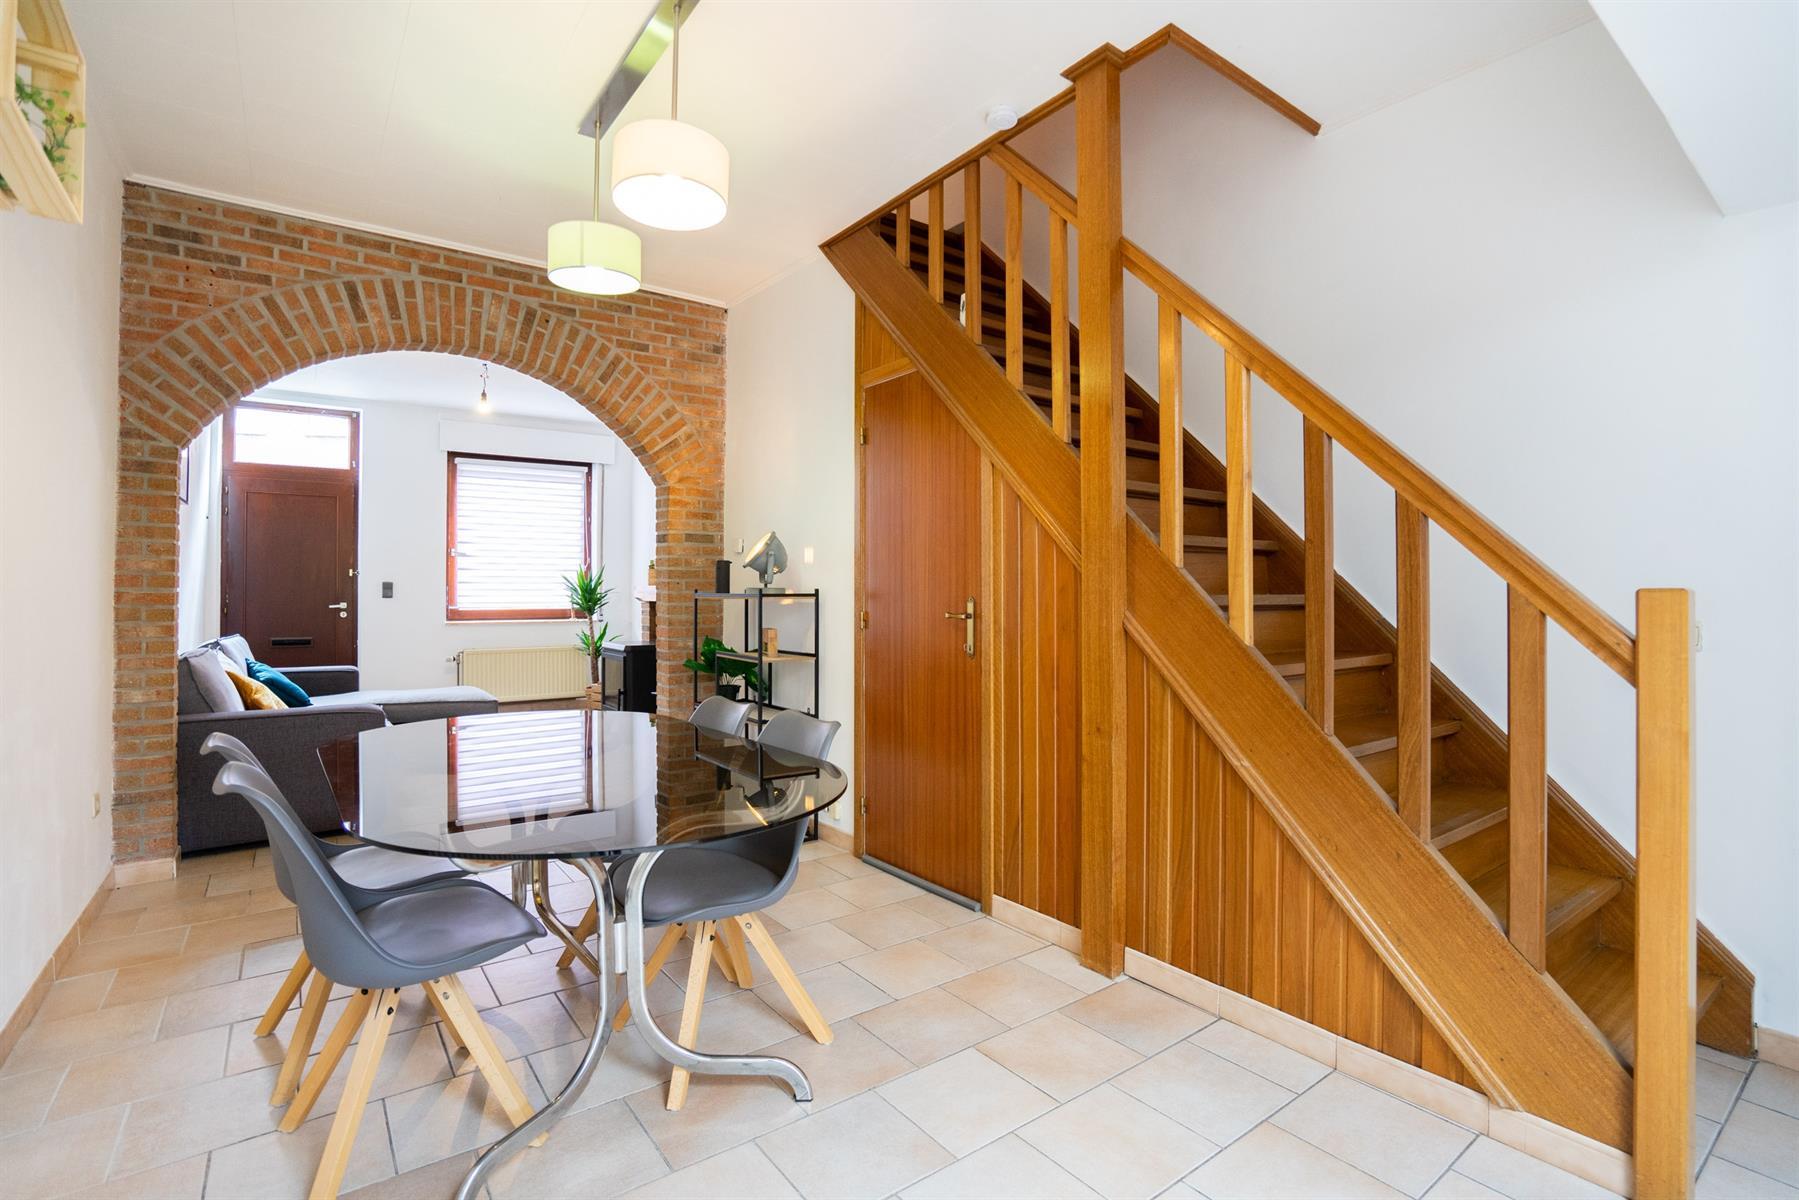 Maison - Beyne-Heusay Bellaire - #4422118-9